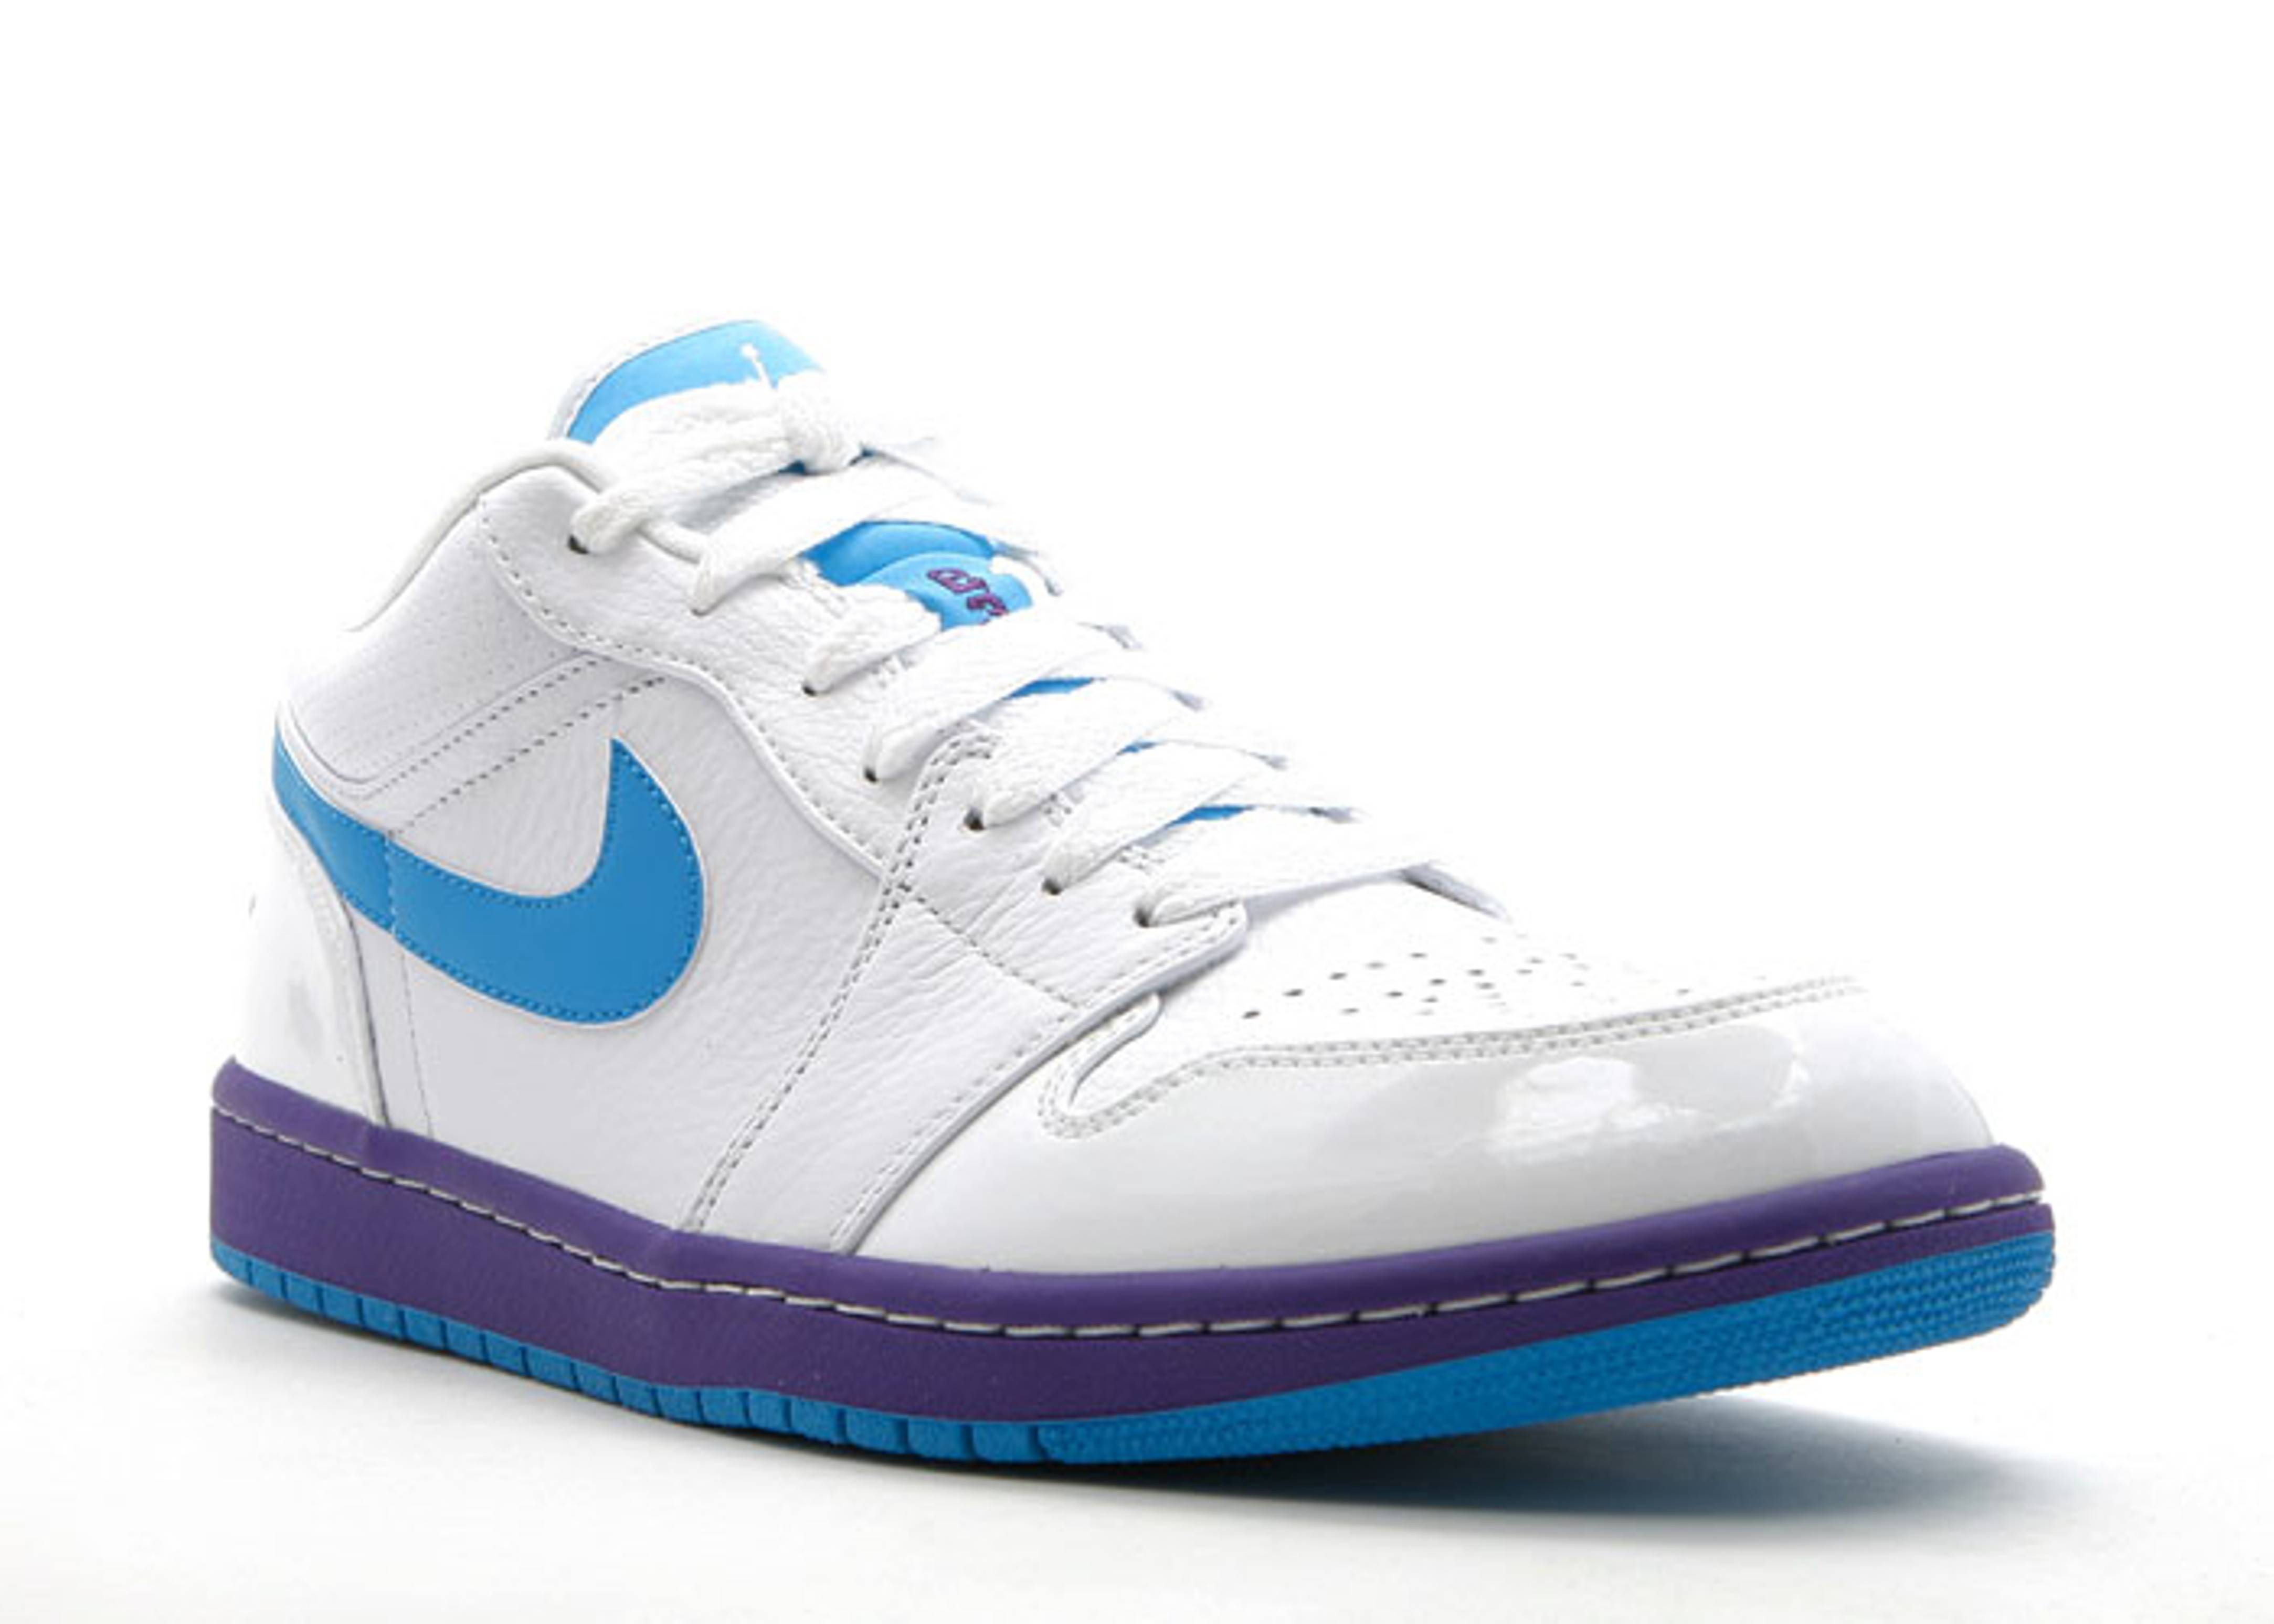 bbc4238d3e77 ... retro phat black stealth court purple white scarpe 2017 6fa3e da7f8   50% off air jordan 1 phat low d798f dad9d